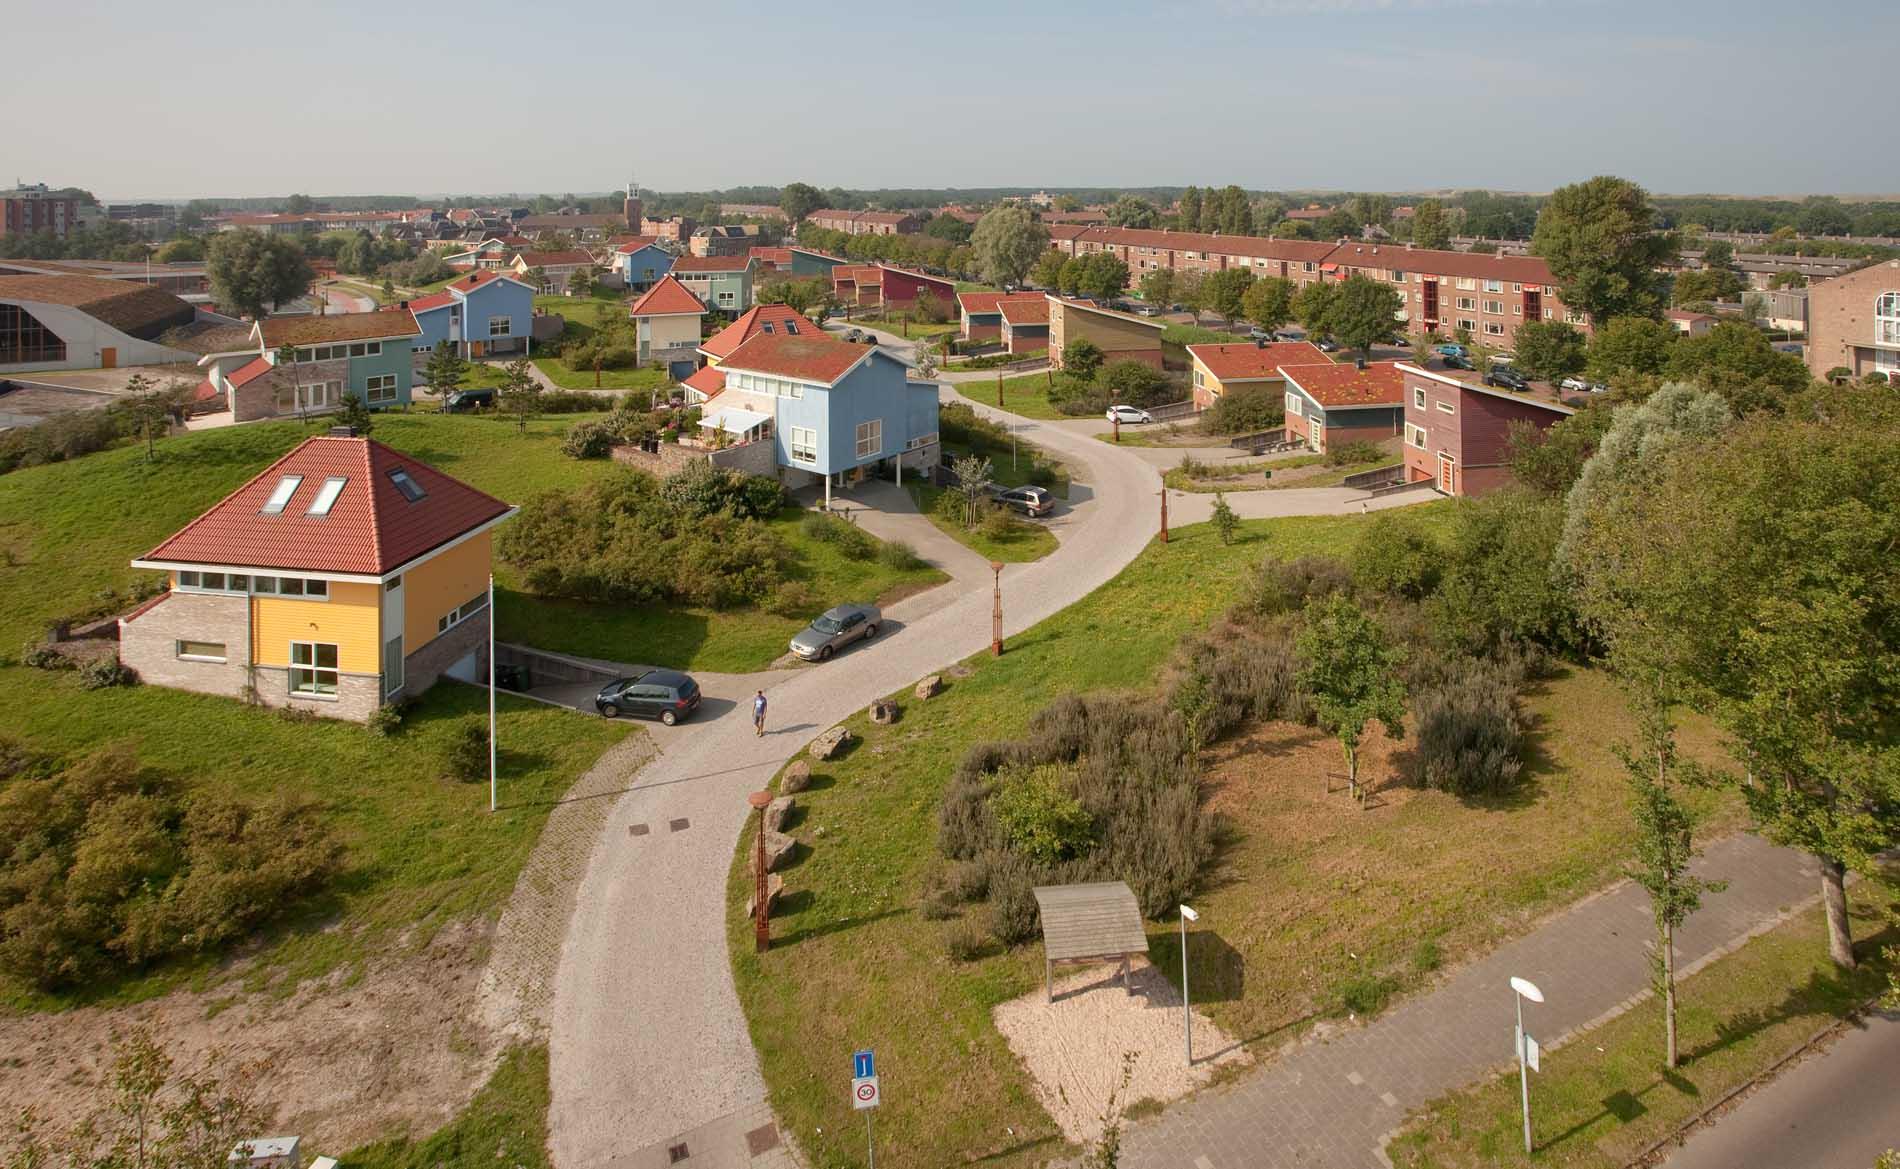 architect woningbouw woningen Duinpark Den Helder herstructurering duinen landschap wonen BBHD architecten